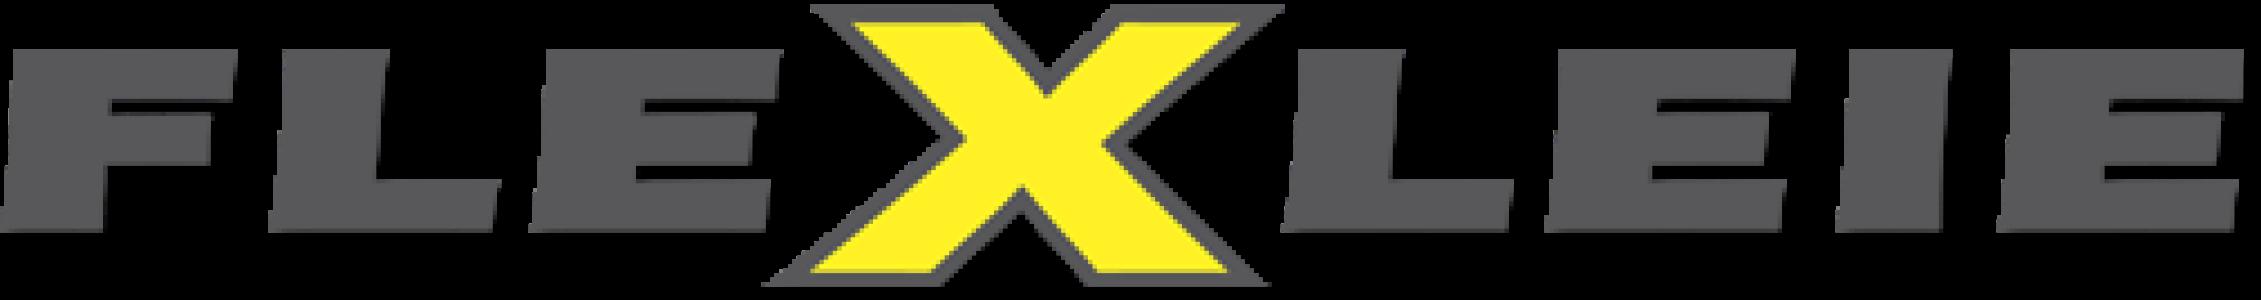 Flexleie